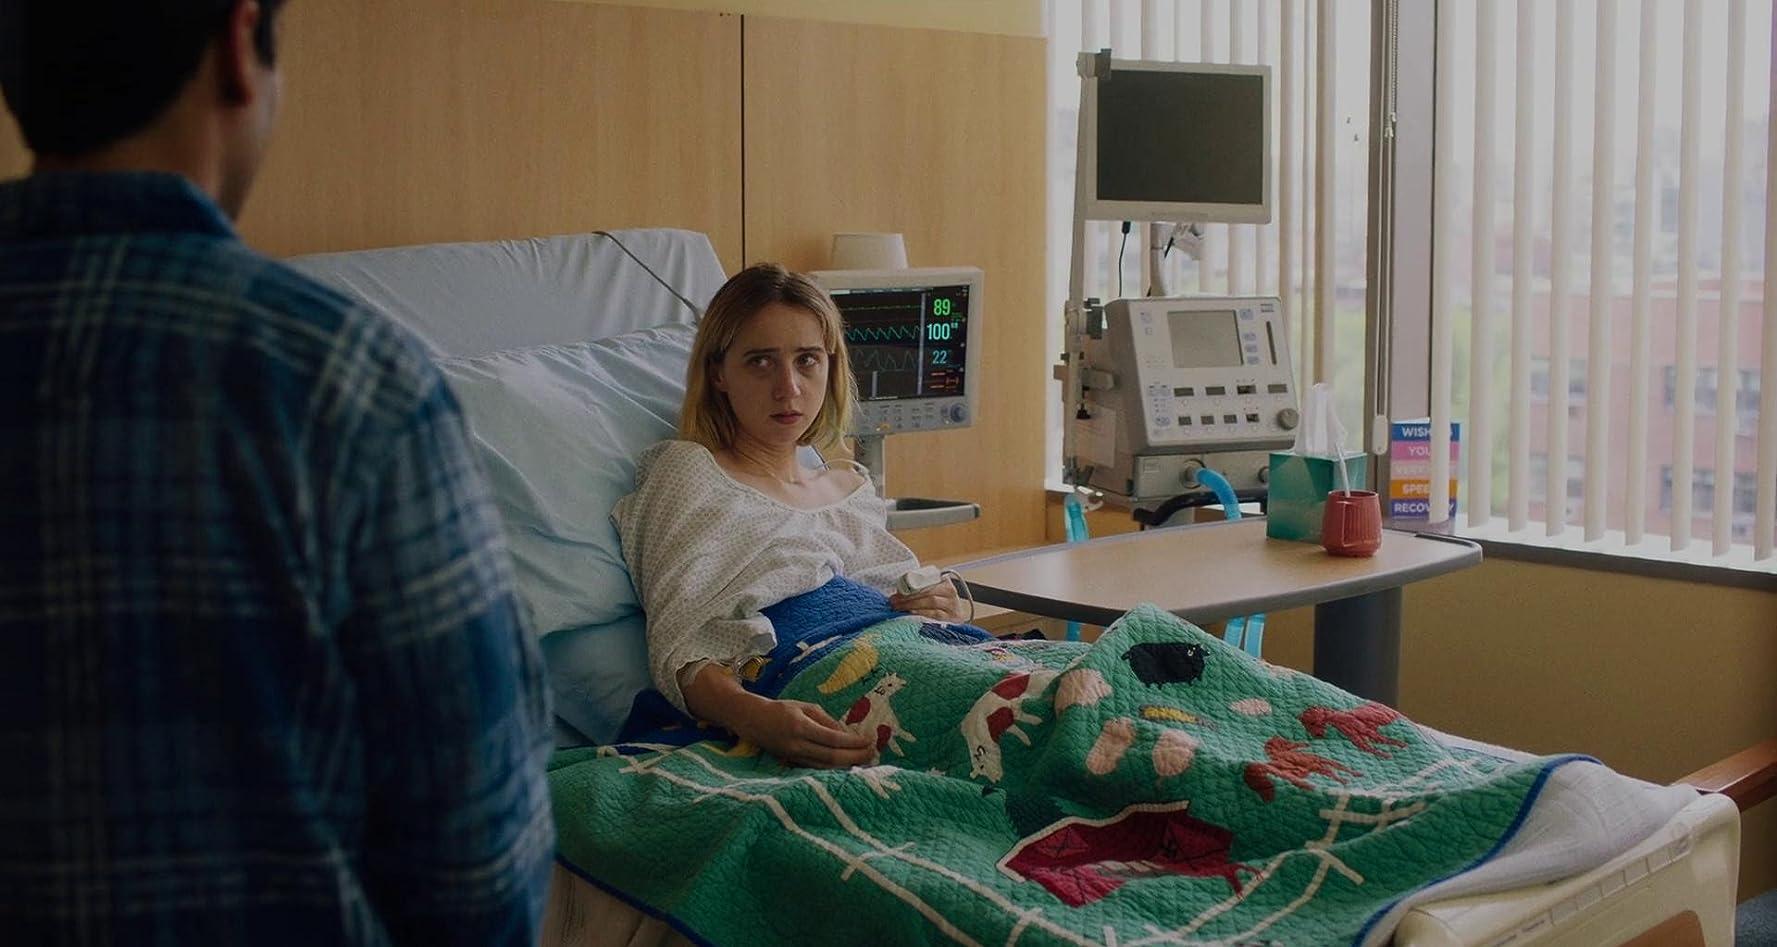 Zoe Kazan and Kumail Nanjiani in The Big Sick (2017)